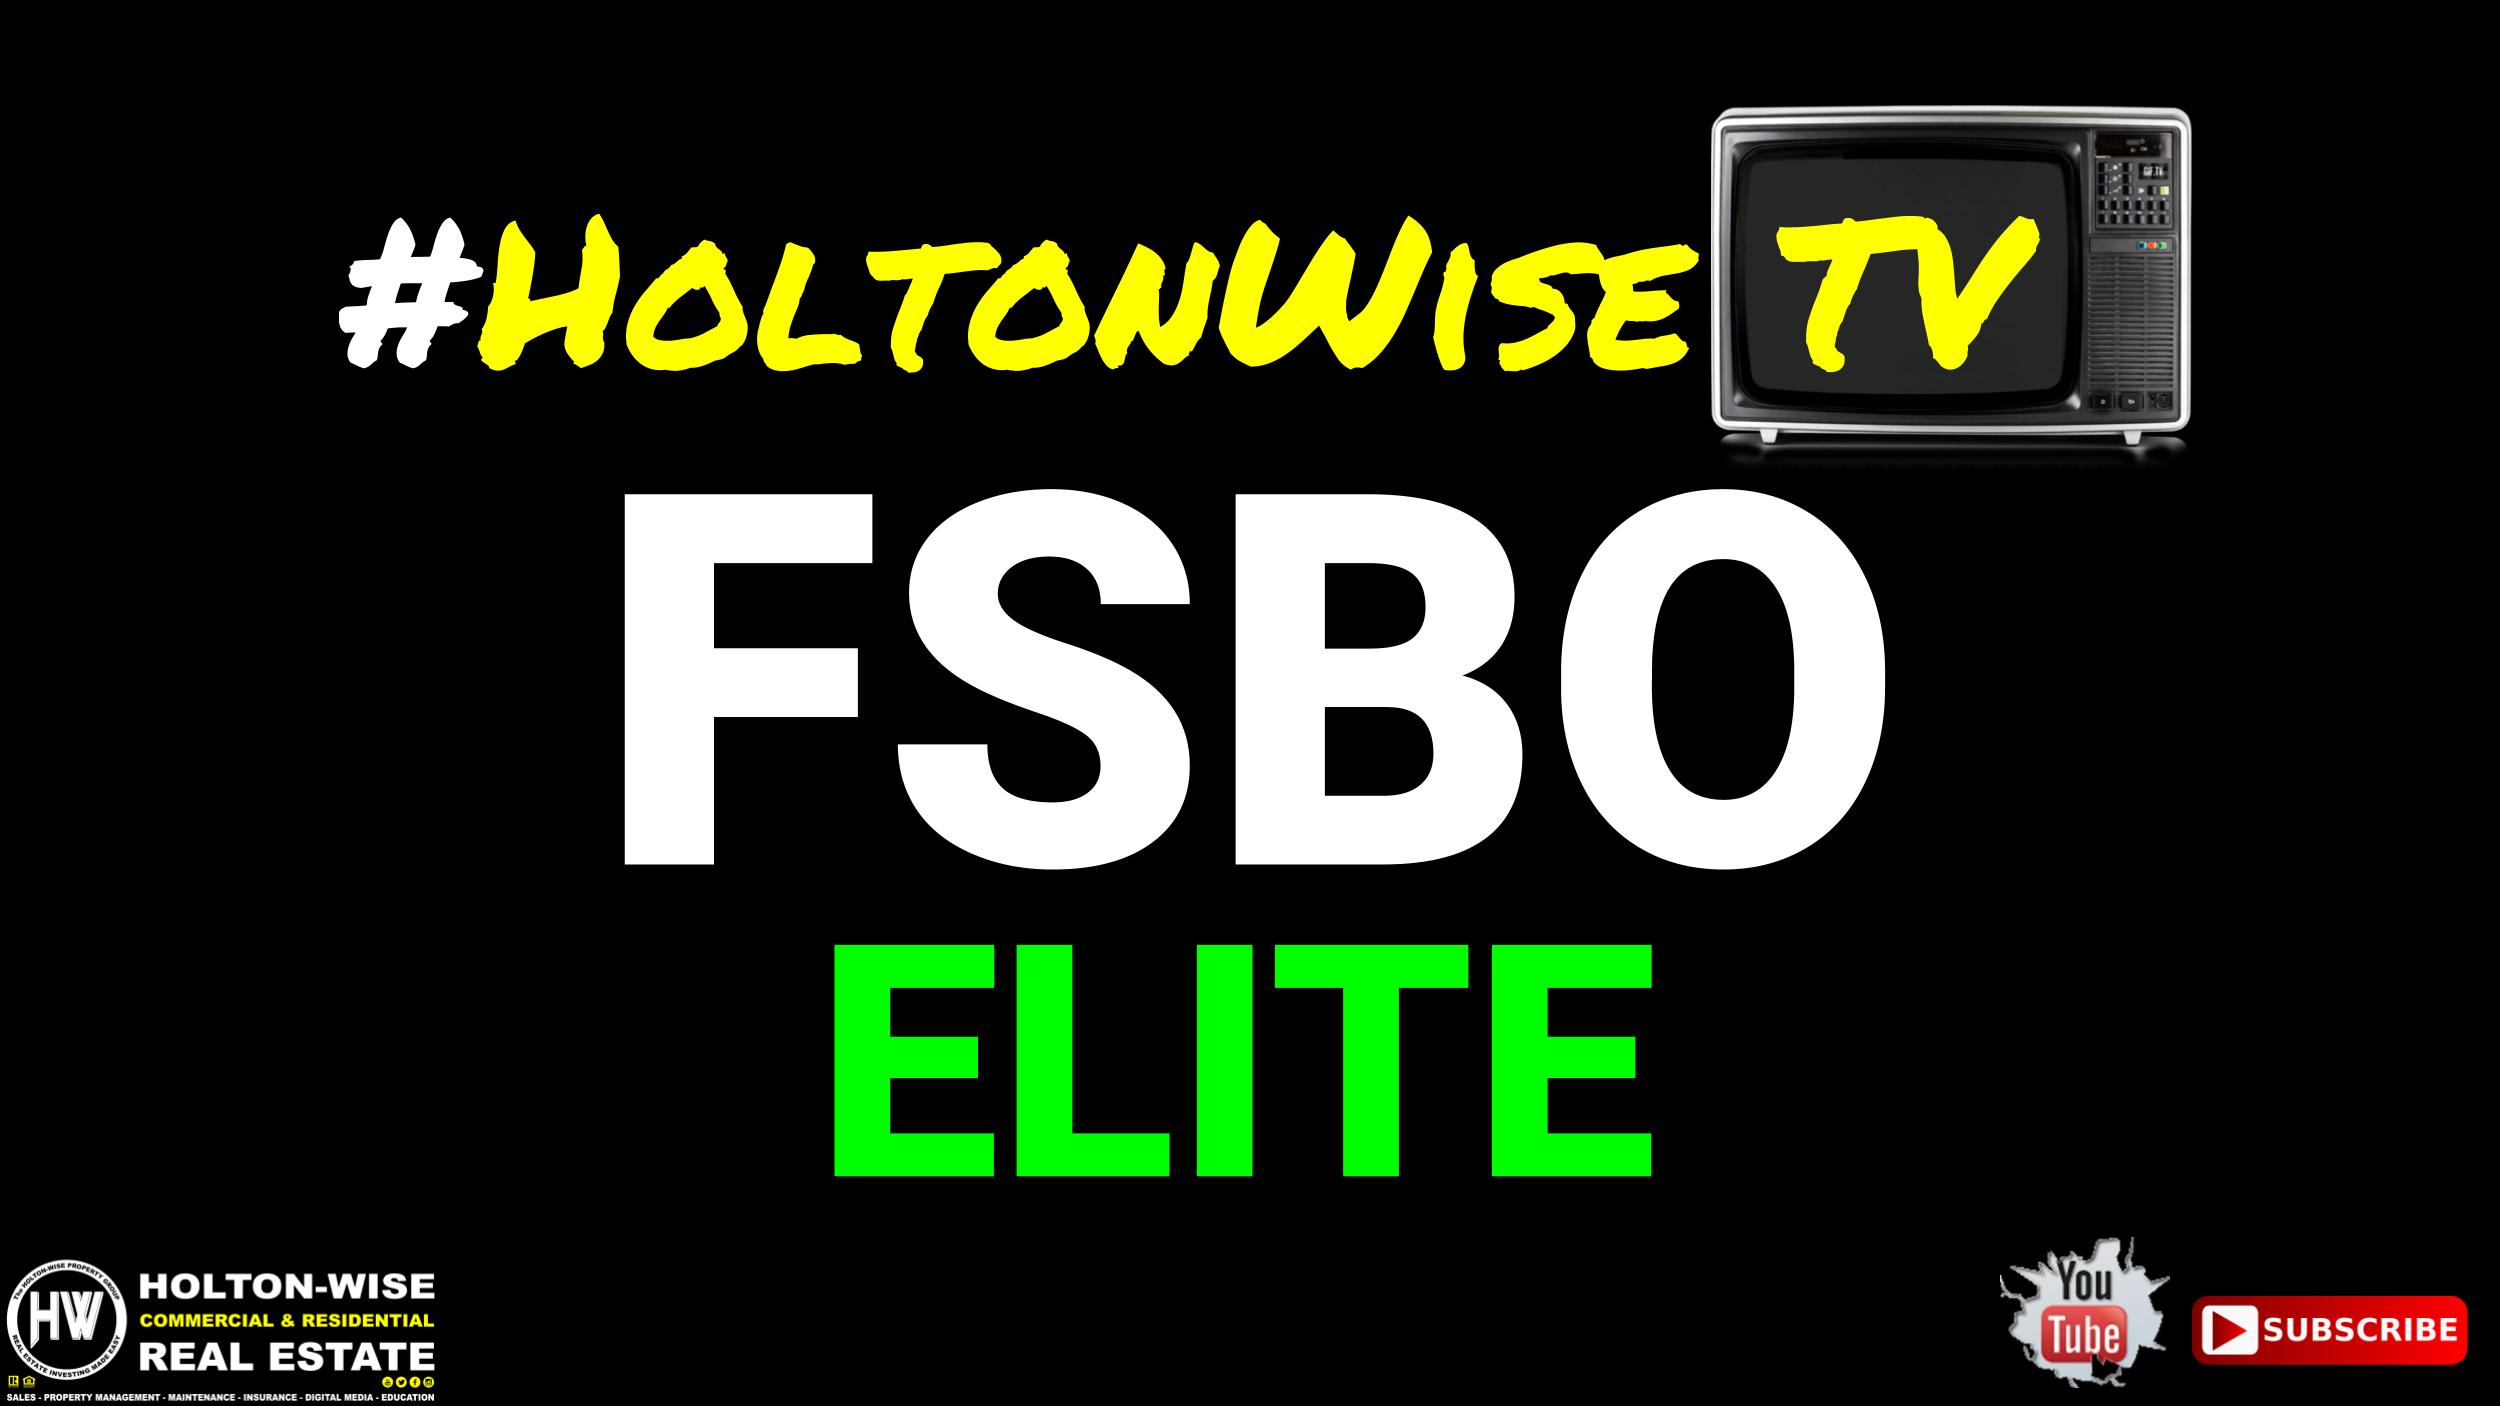 FSBO Package - Elite